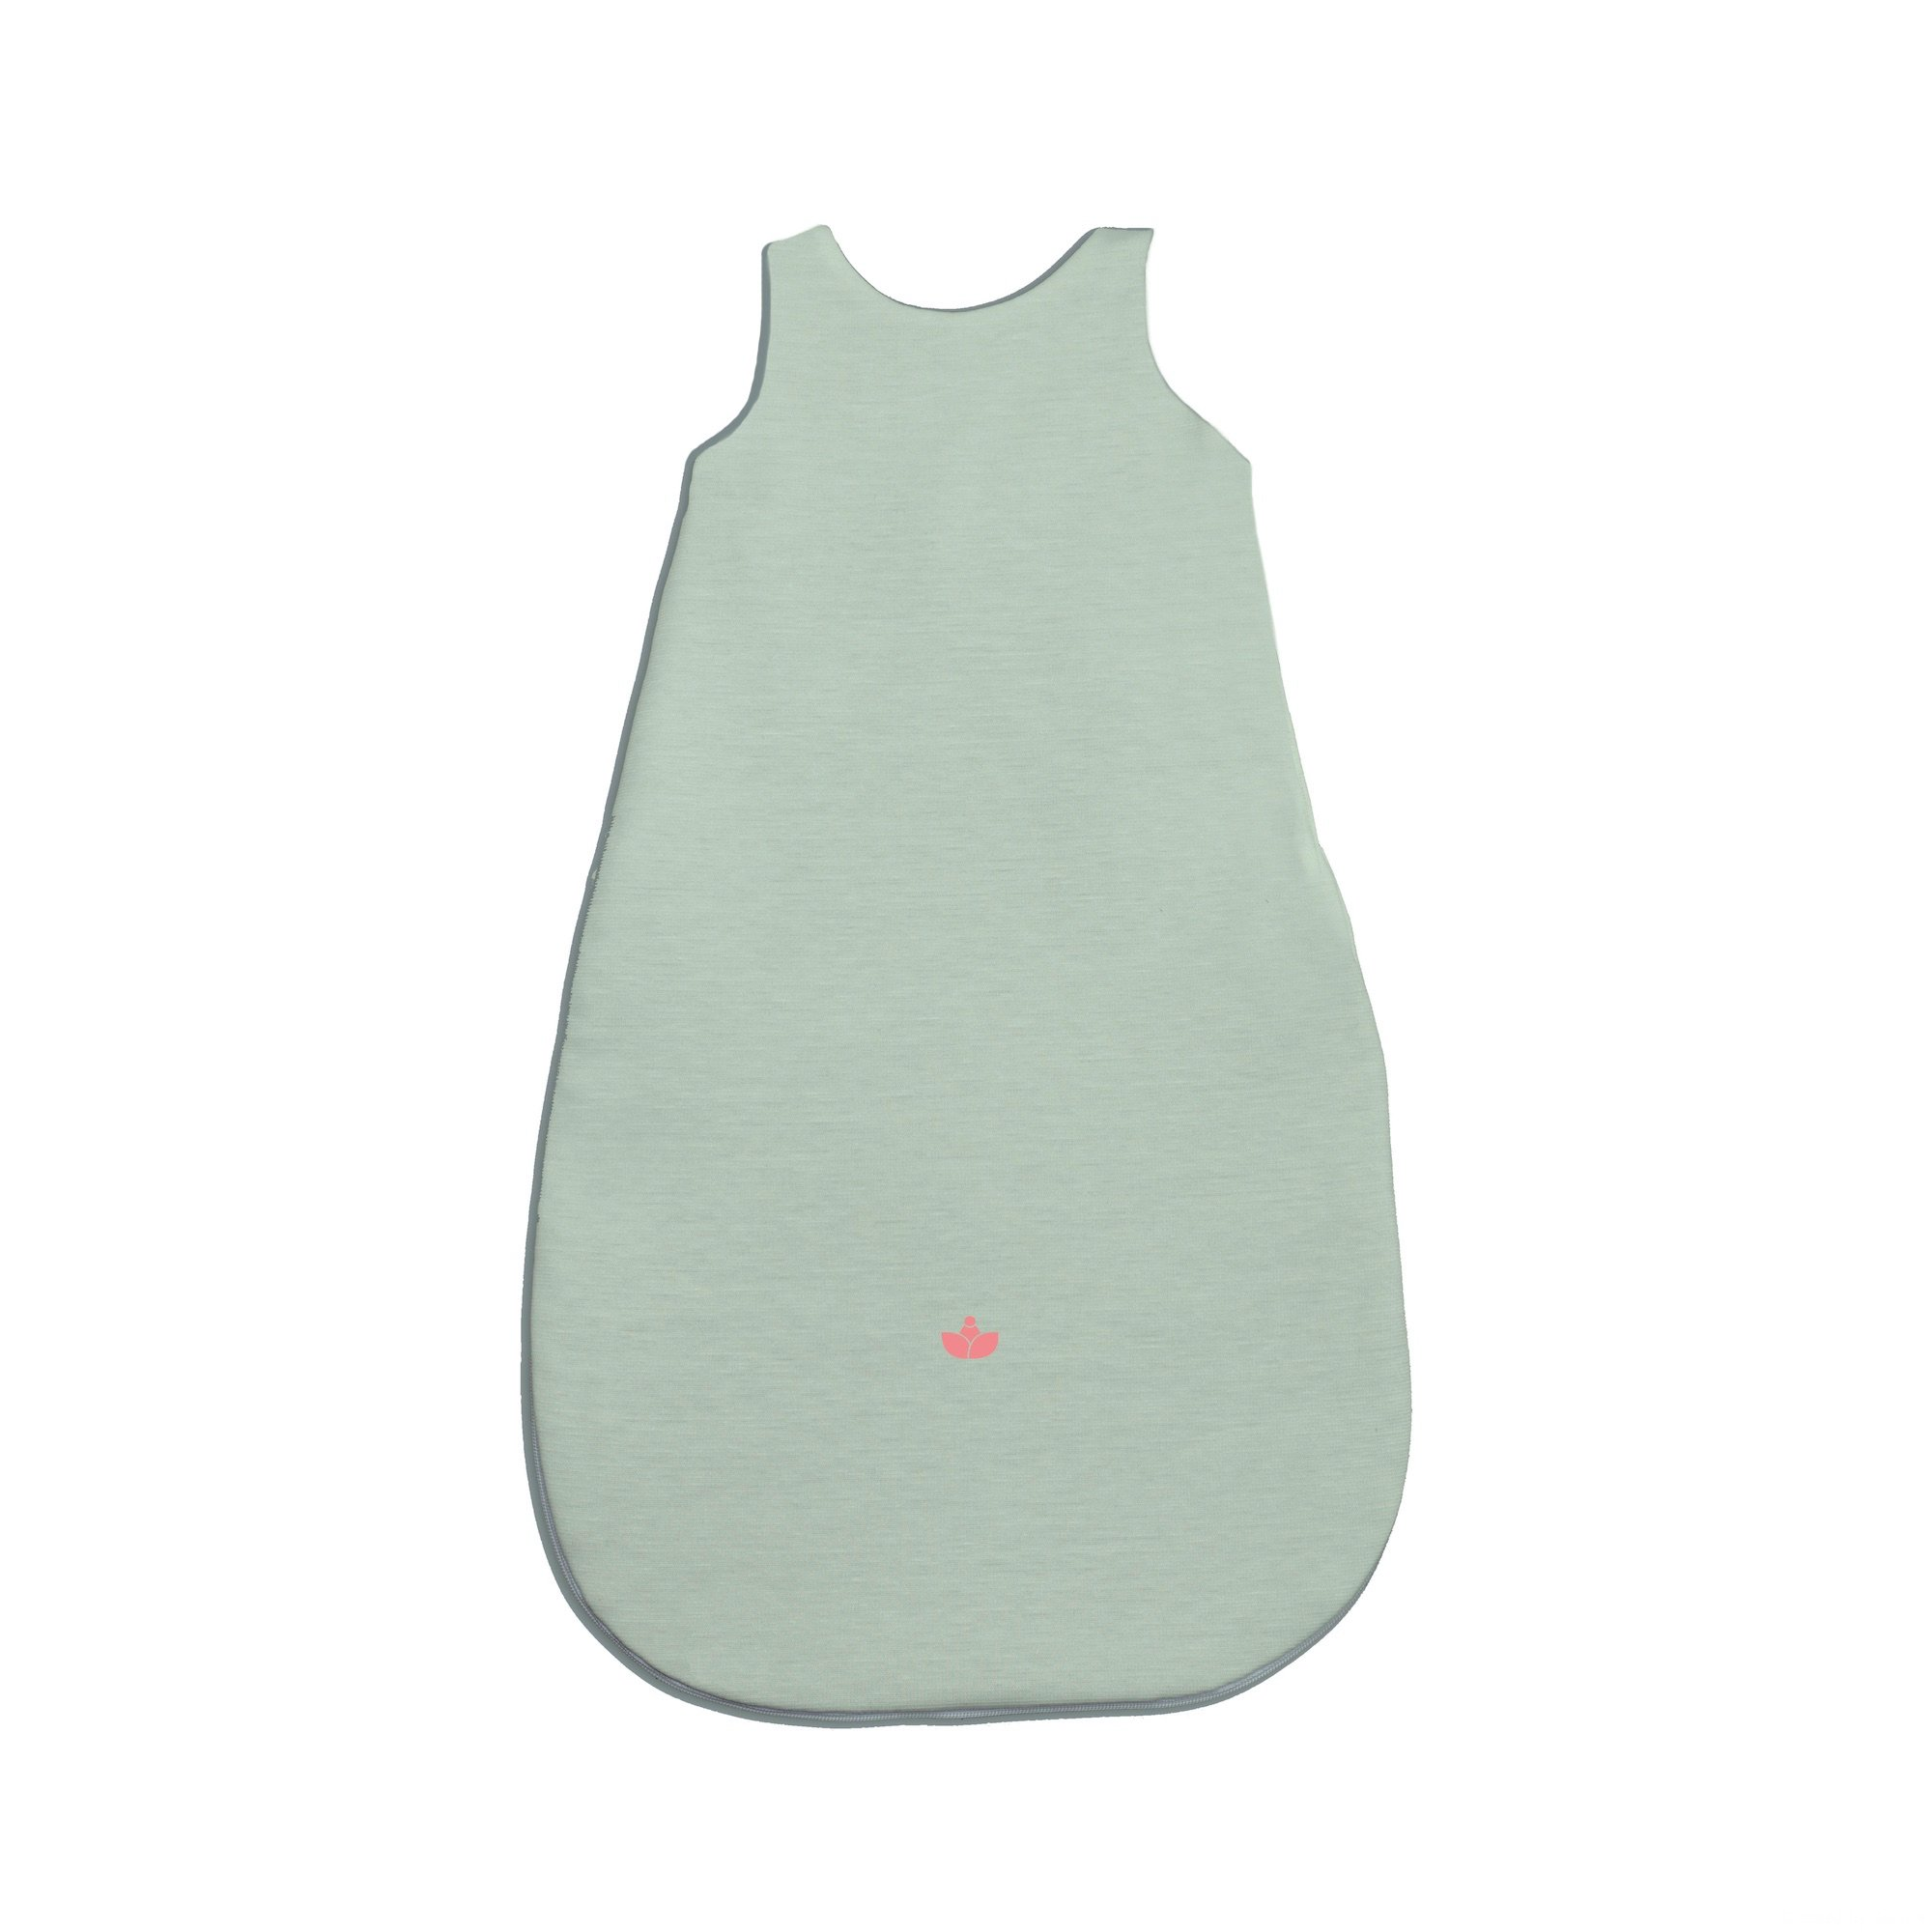 Little Lotus Sleeping Bag, Medium (6-12 Months), Lotus Mint